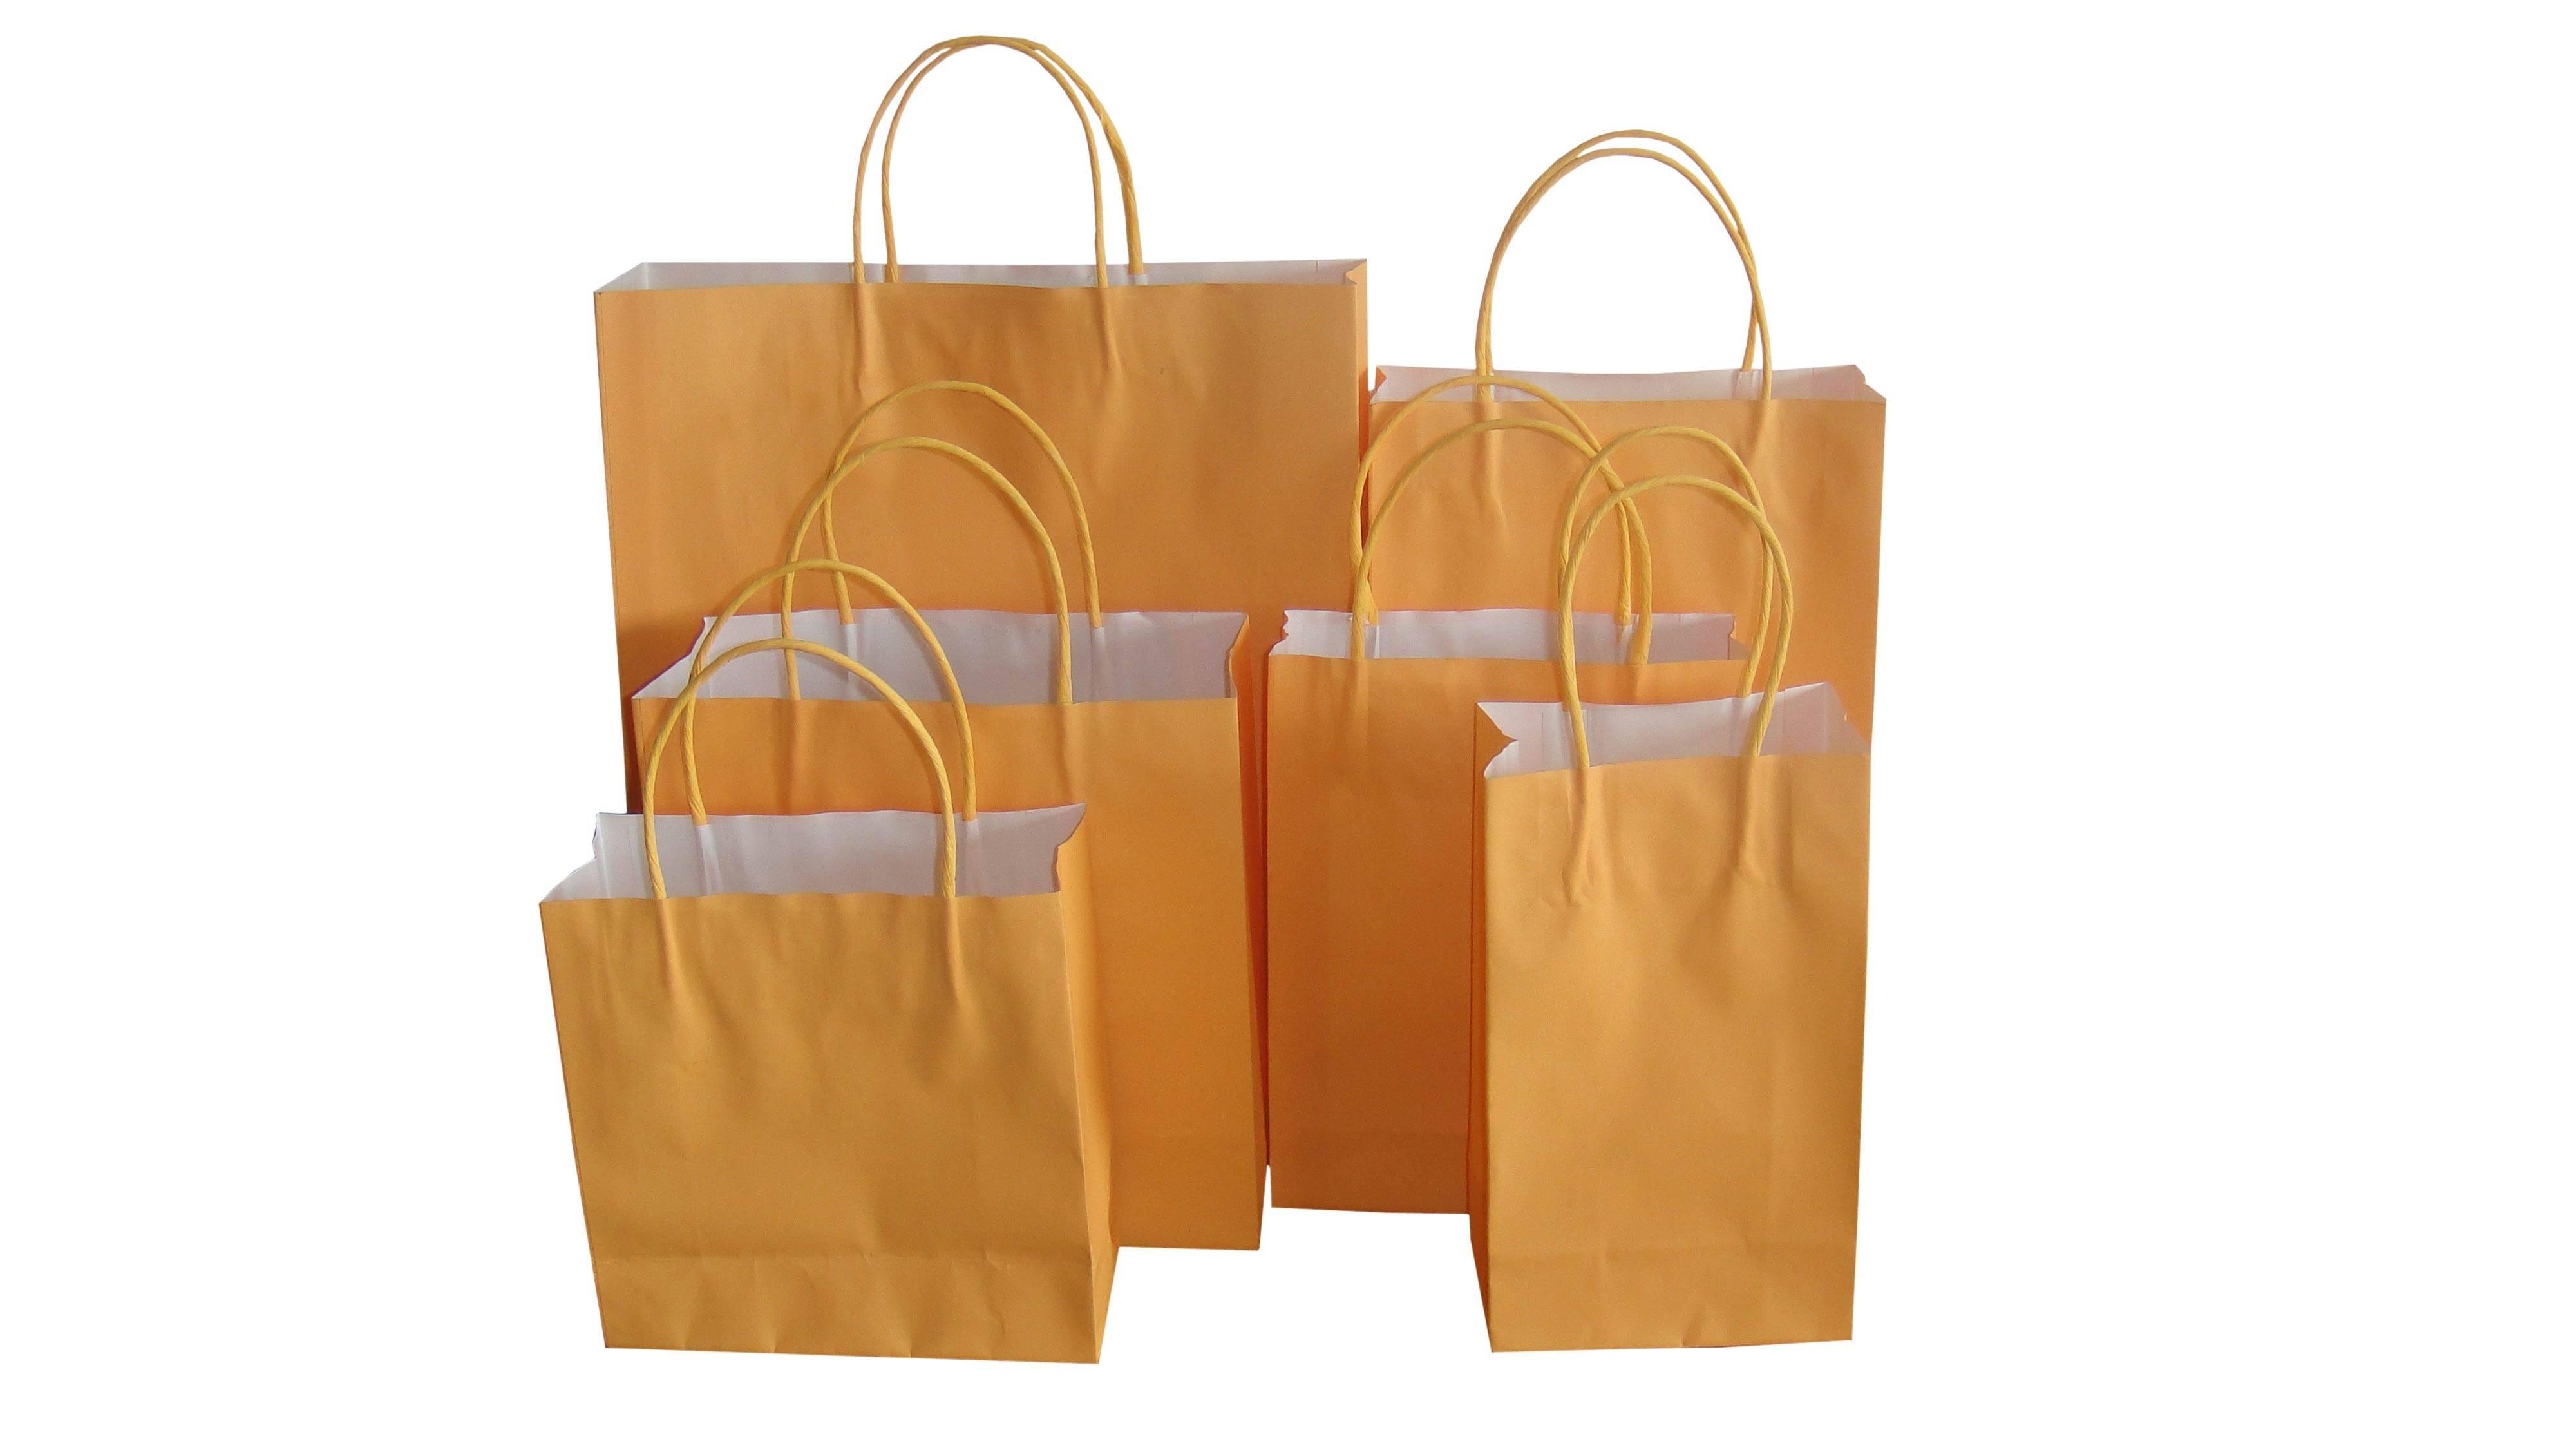 PAPER BOX / SHOPPING BAG / PACKAGE BAG